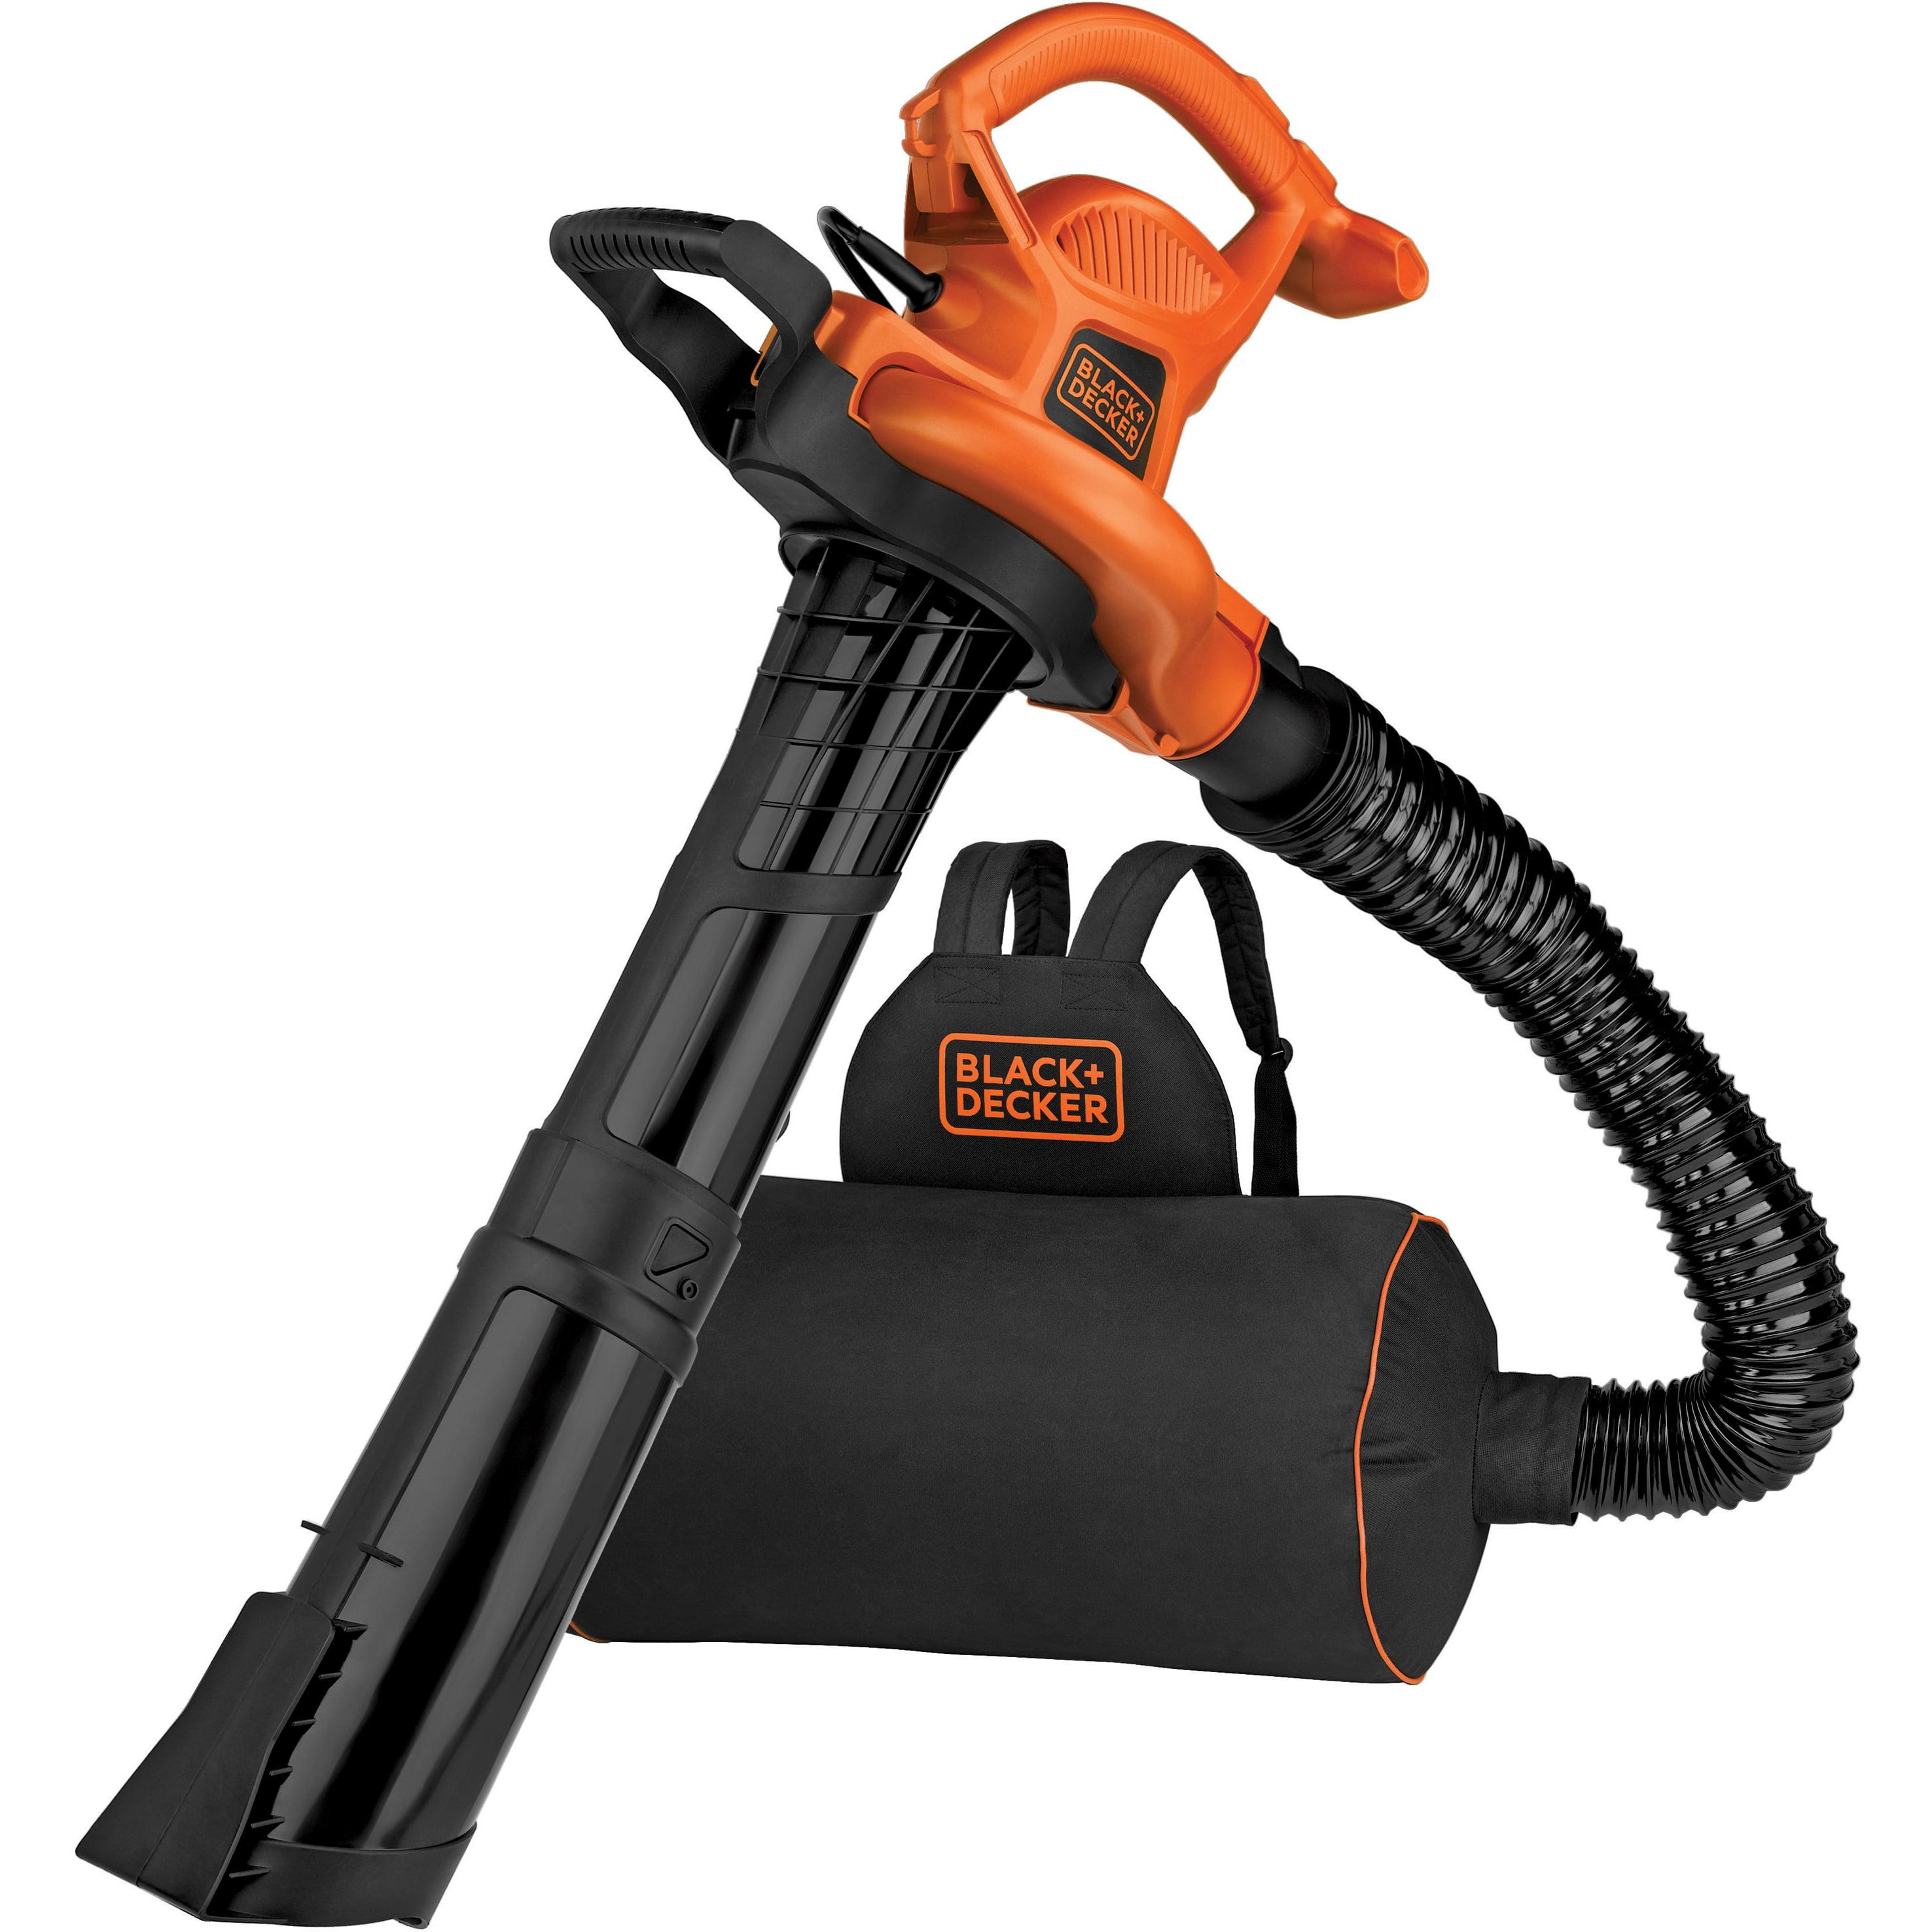 BLACK+DECKER BEBL7000 3-N-1 VACPACK 12 Amp Leaf Blower, Vacuum, and Mulcher